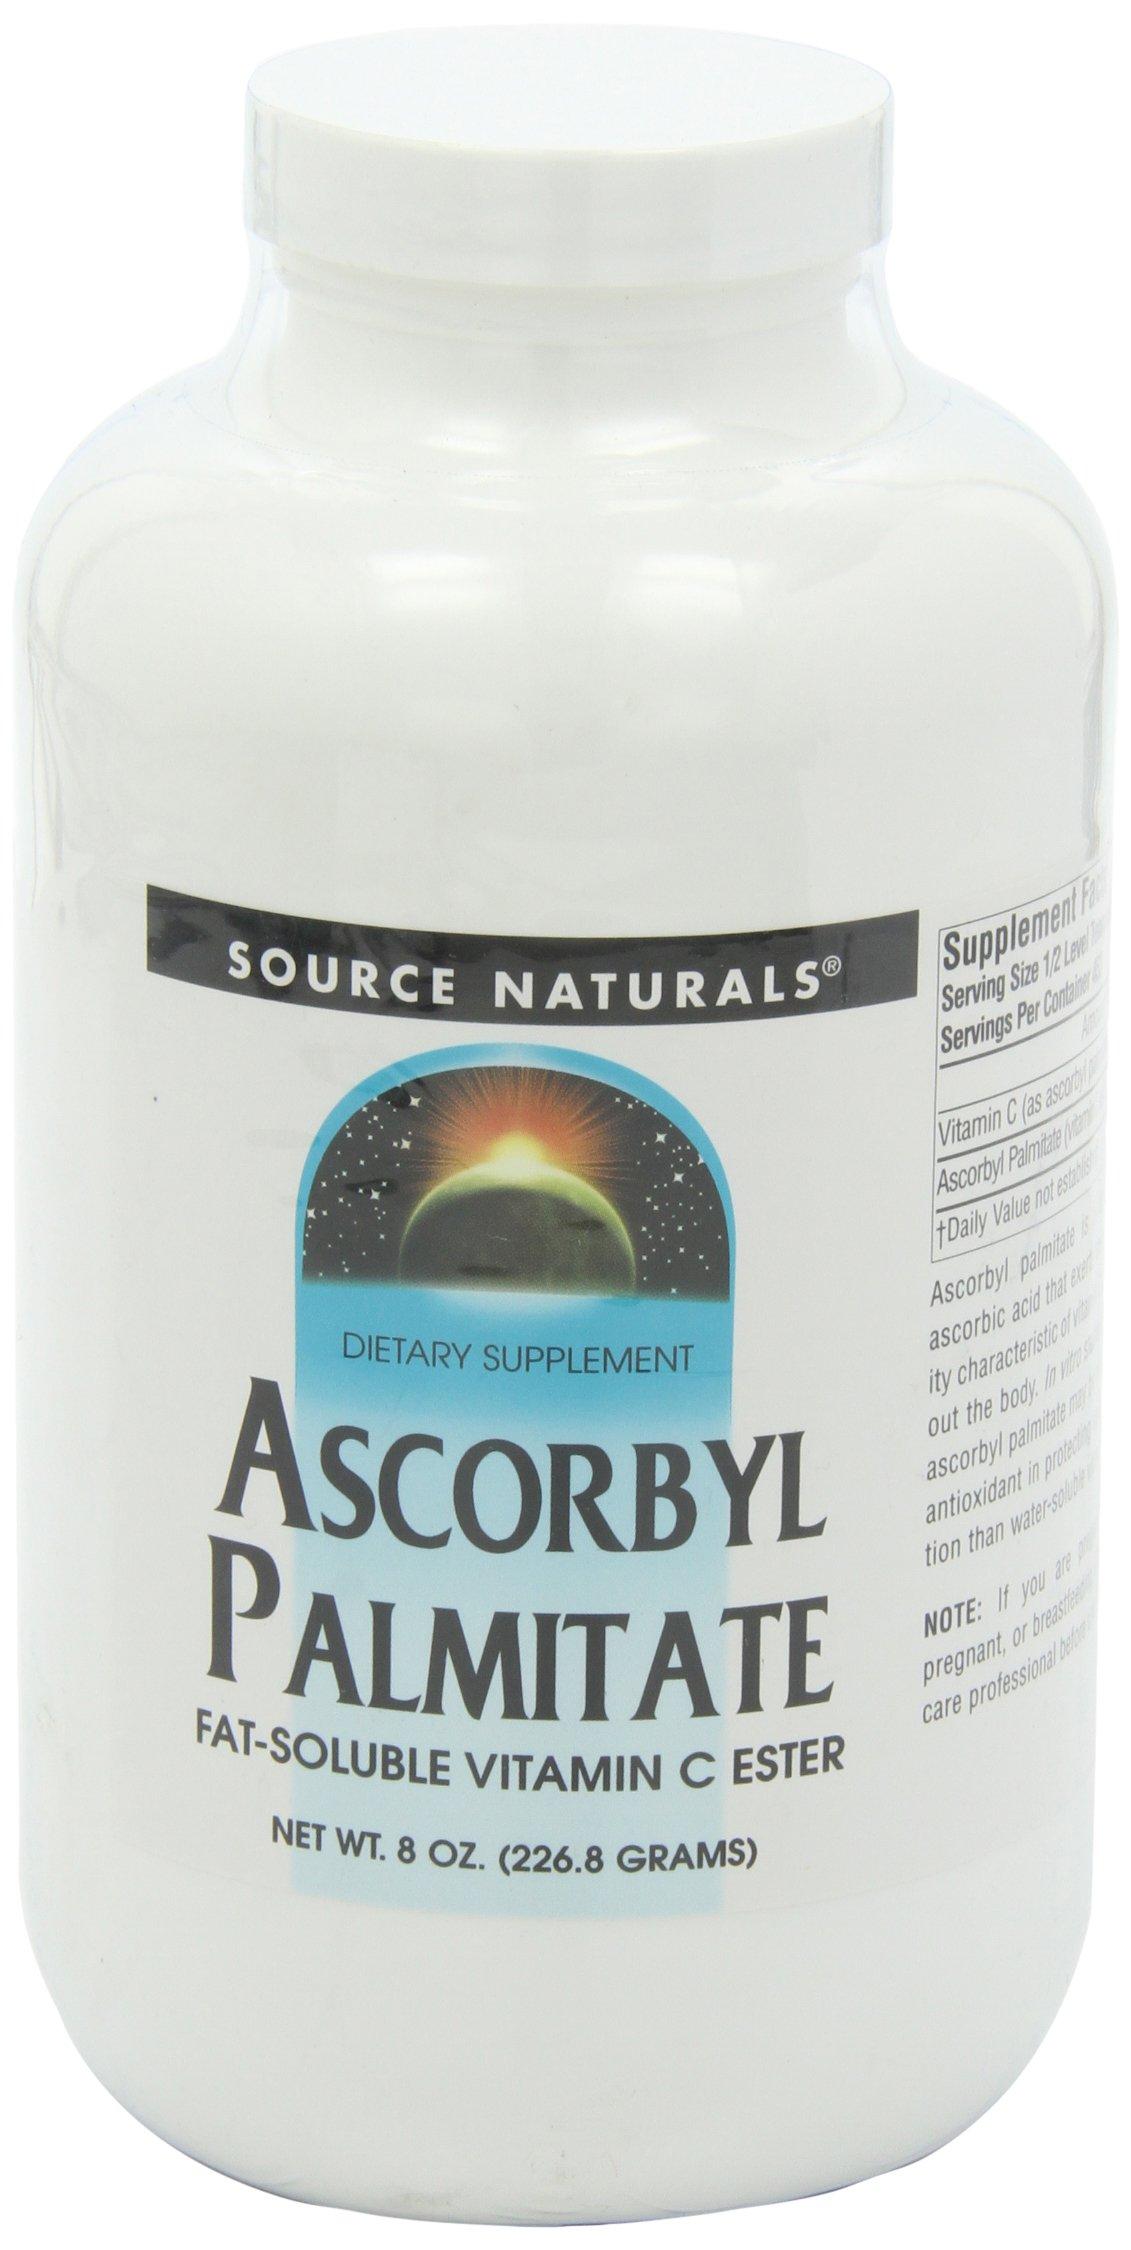 Source Naturals Ascorbyl Palmitate 500mg Powder - Fat-Soluble Vitamin C Ester Supplement - 8 Powder